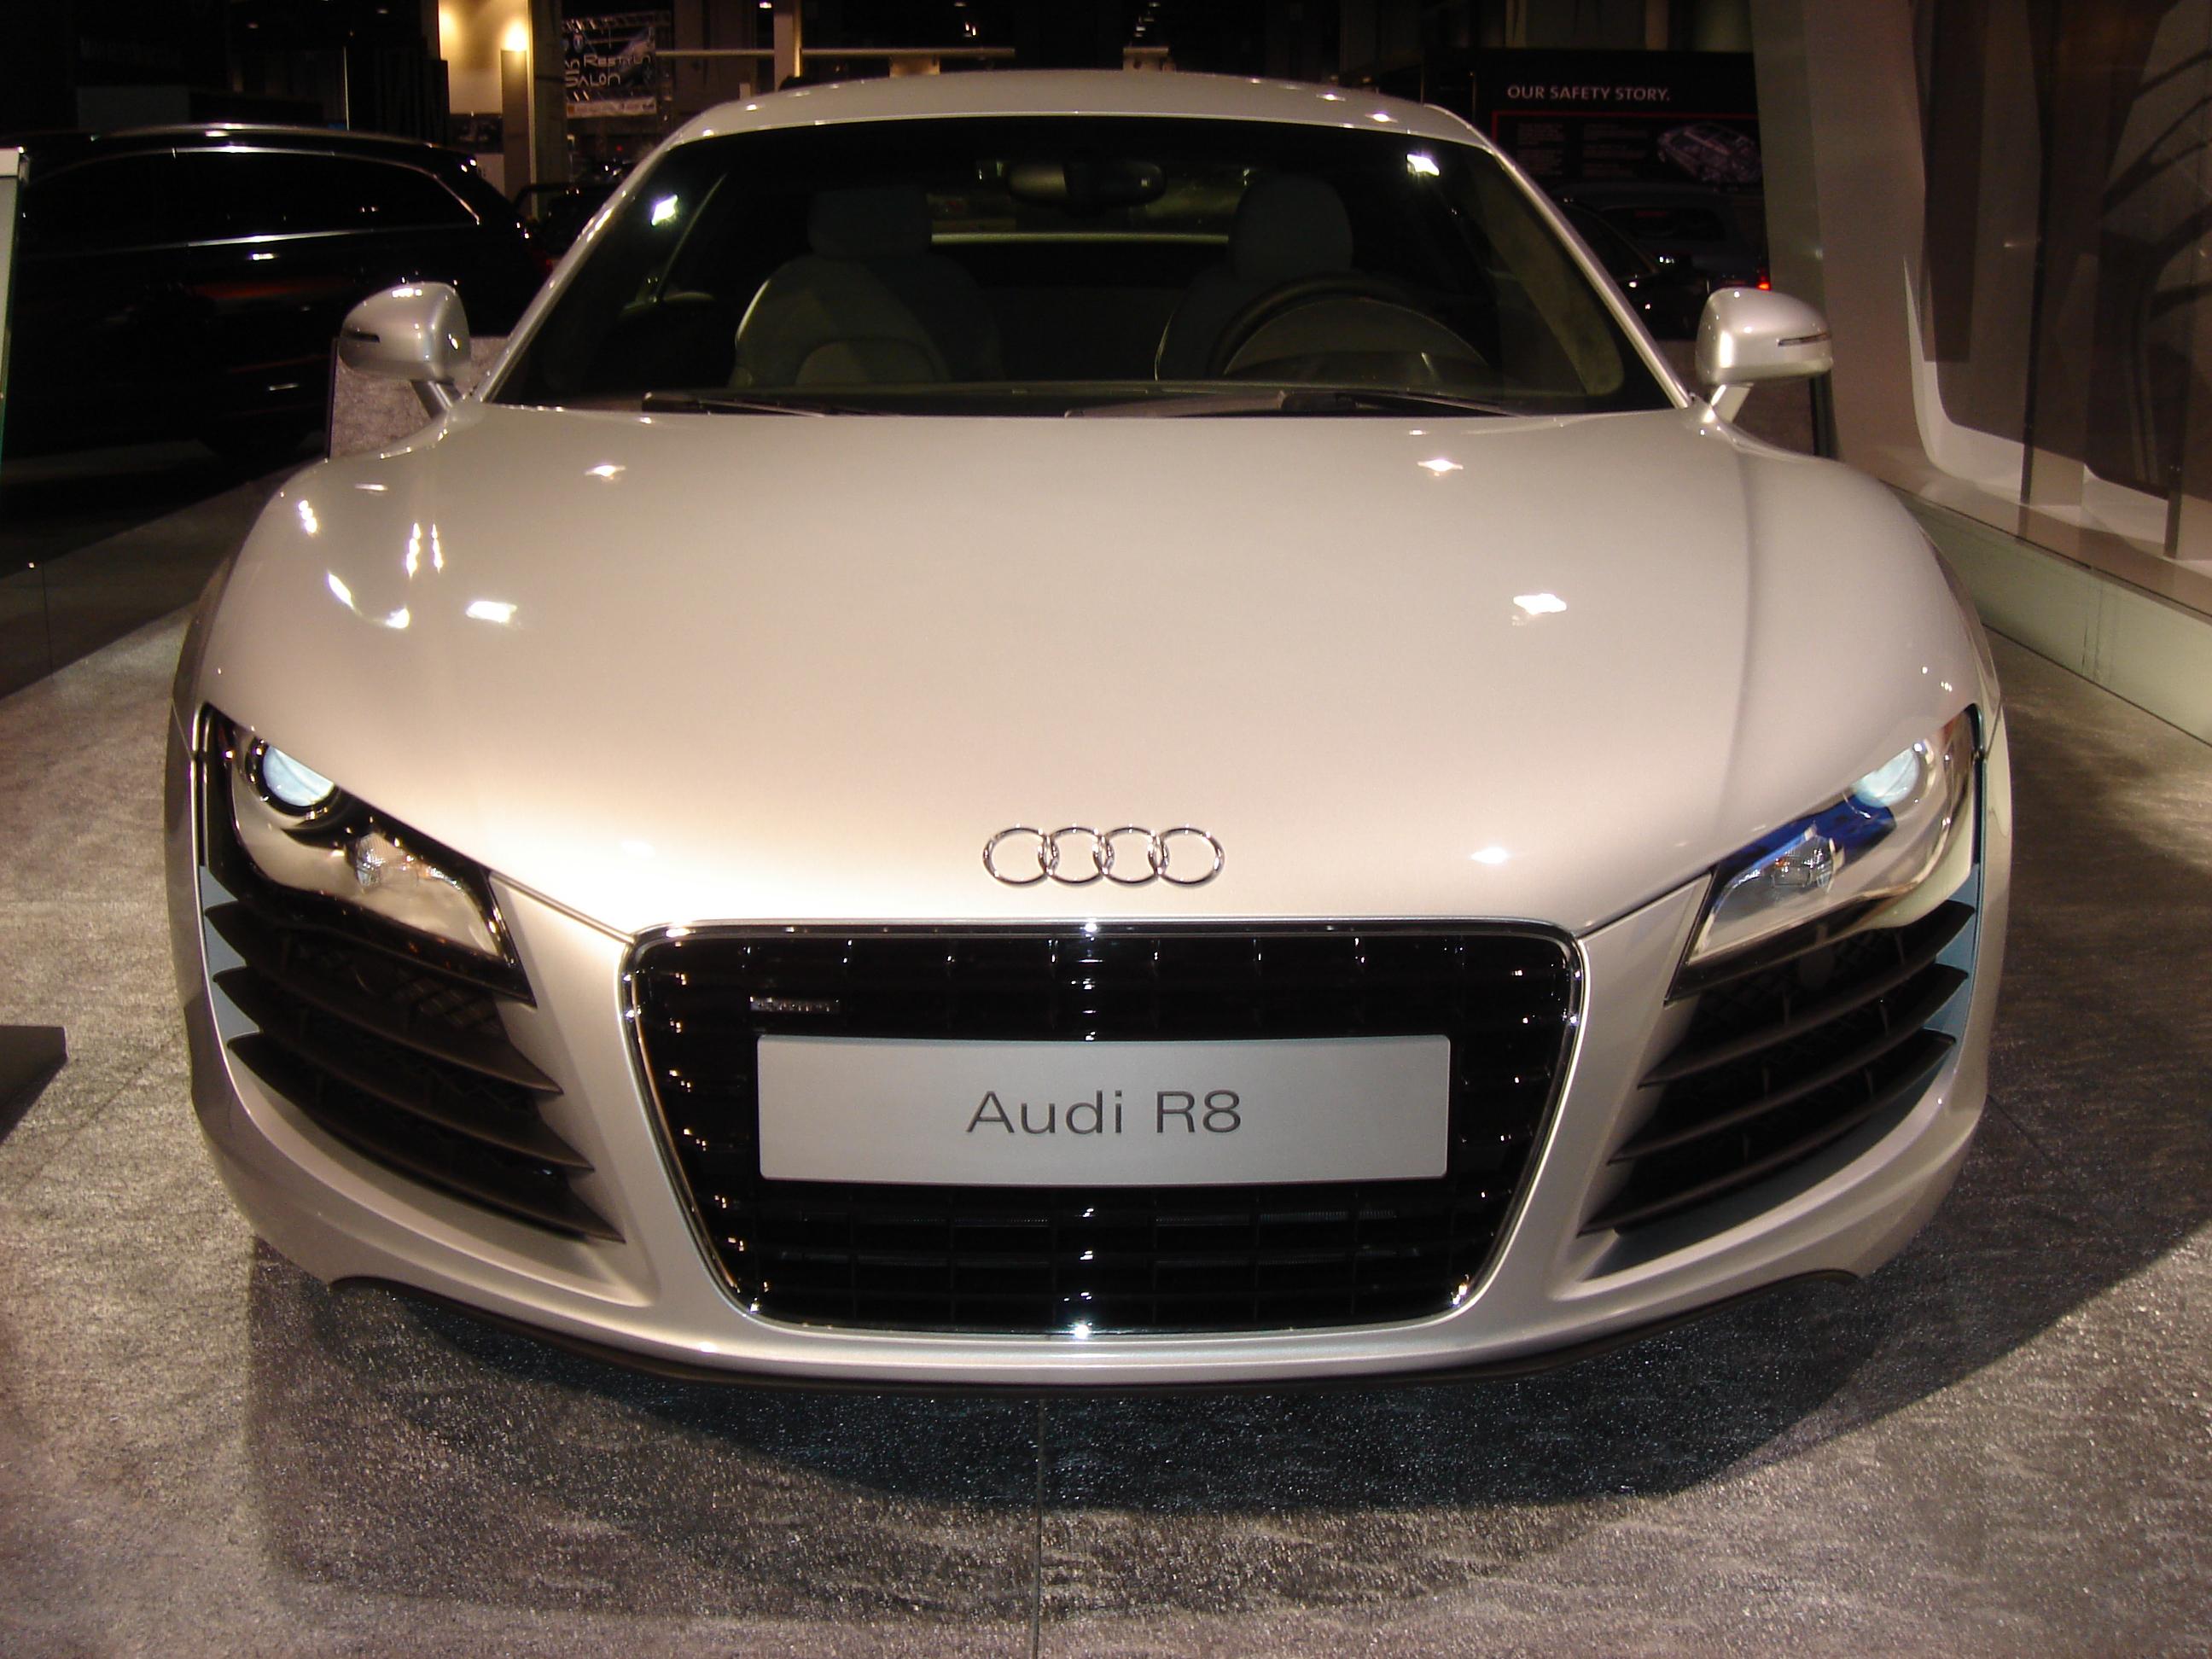 ���������� ���������� ����� ���� ���� Audi_R8_front.JPG